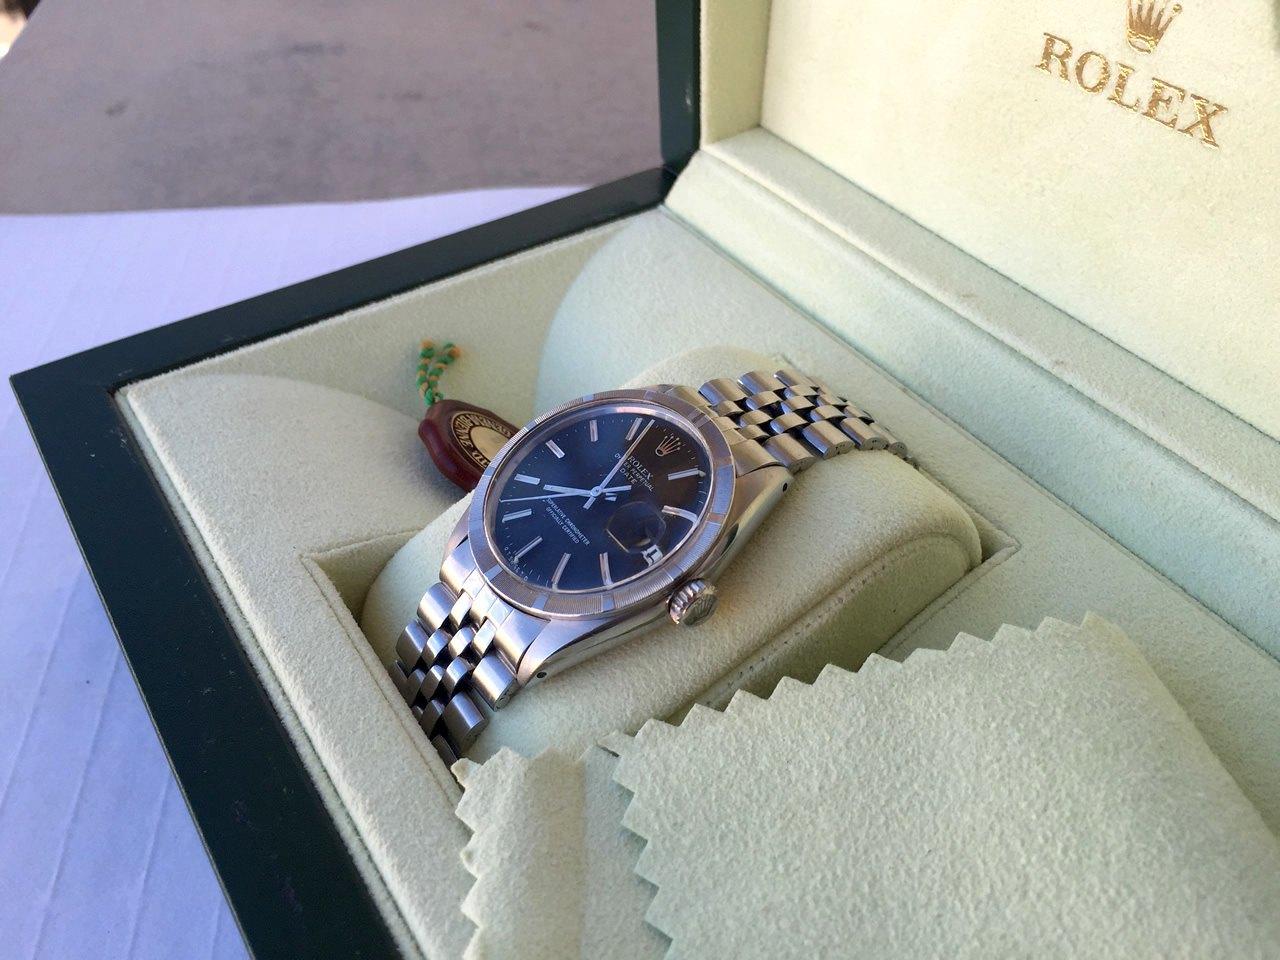 Rolex Oyster Perpetual Date 1501 año 1965